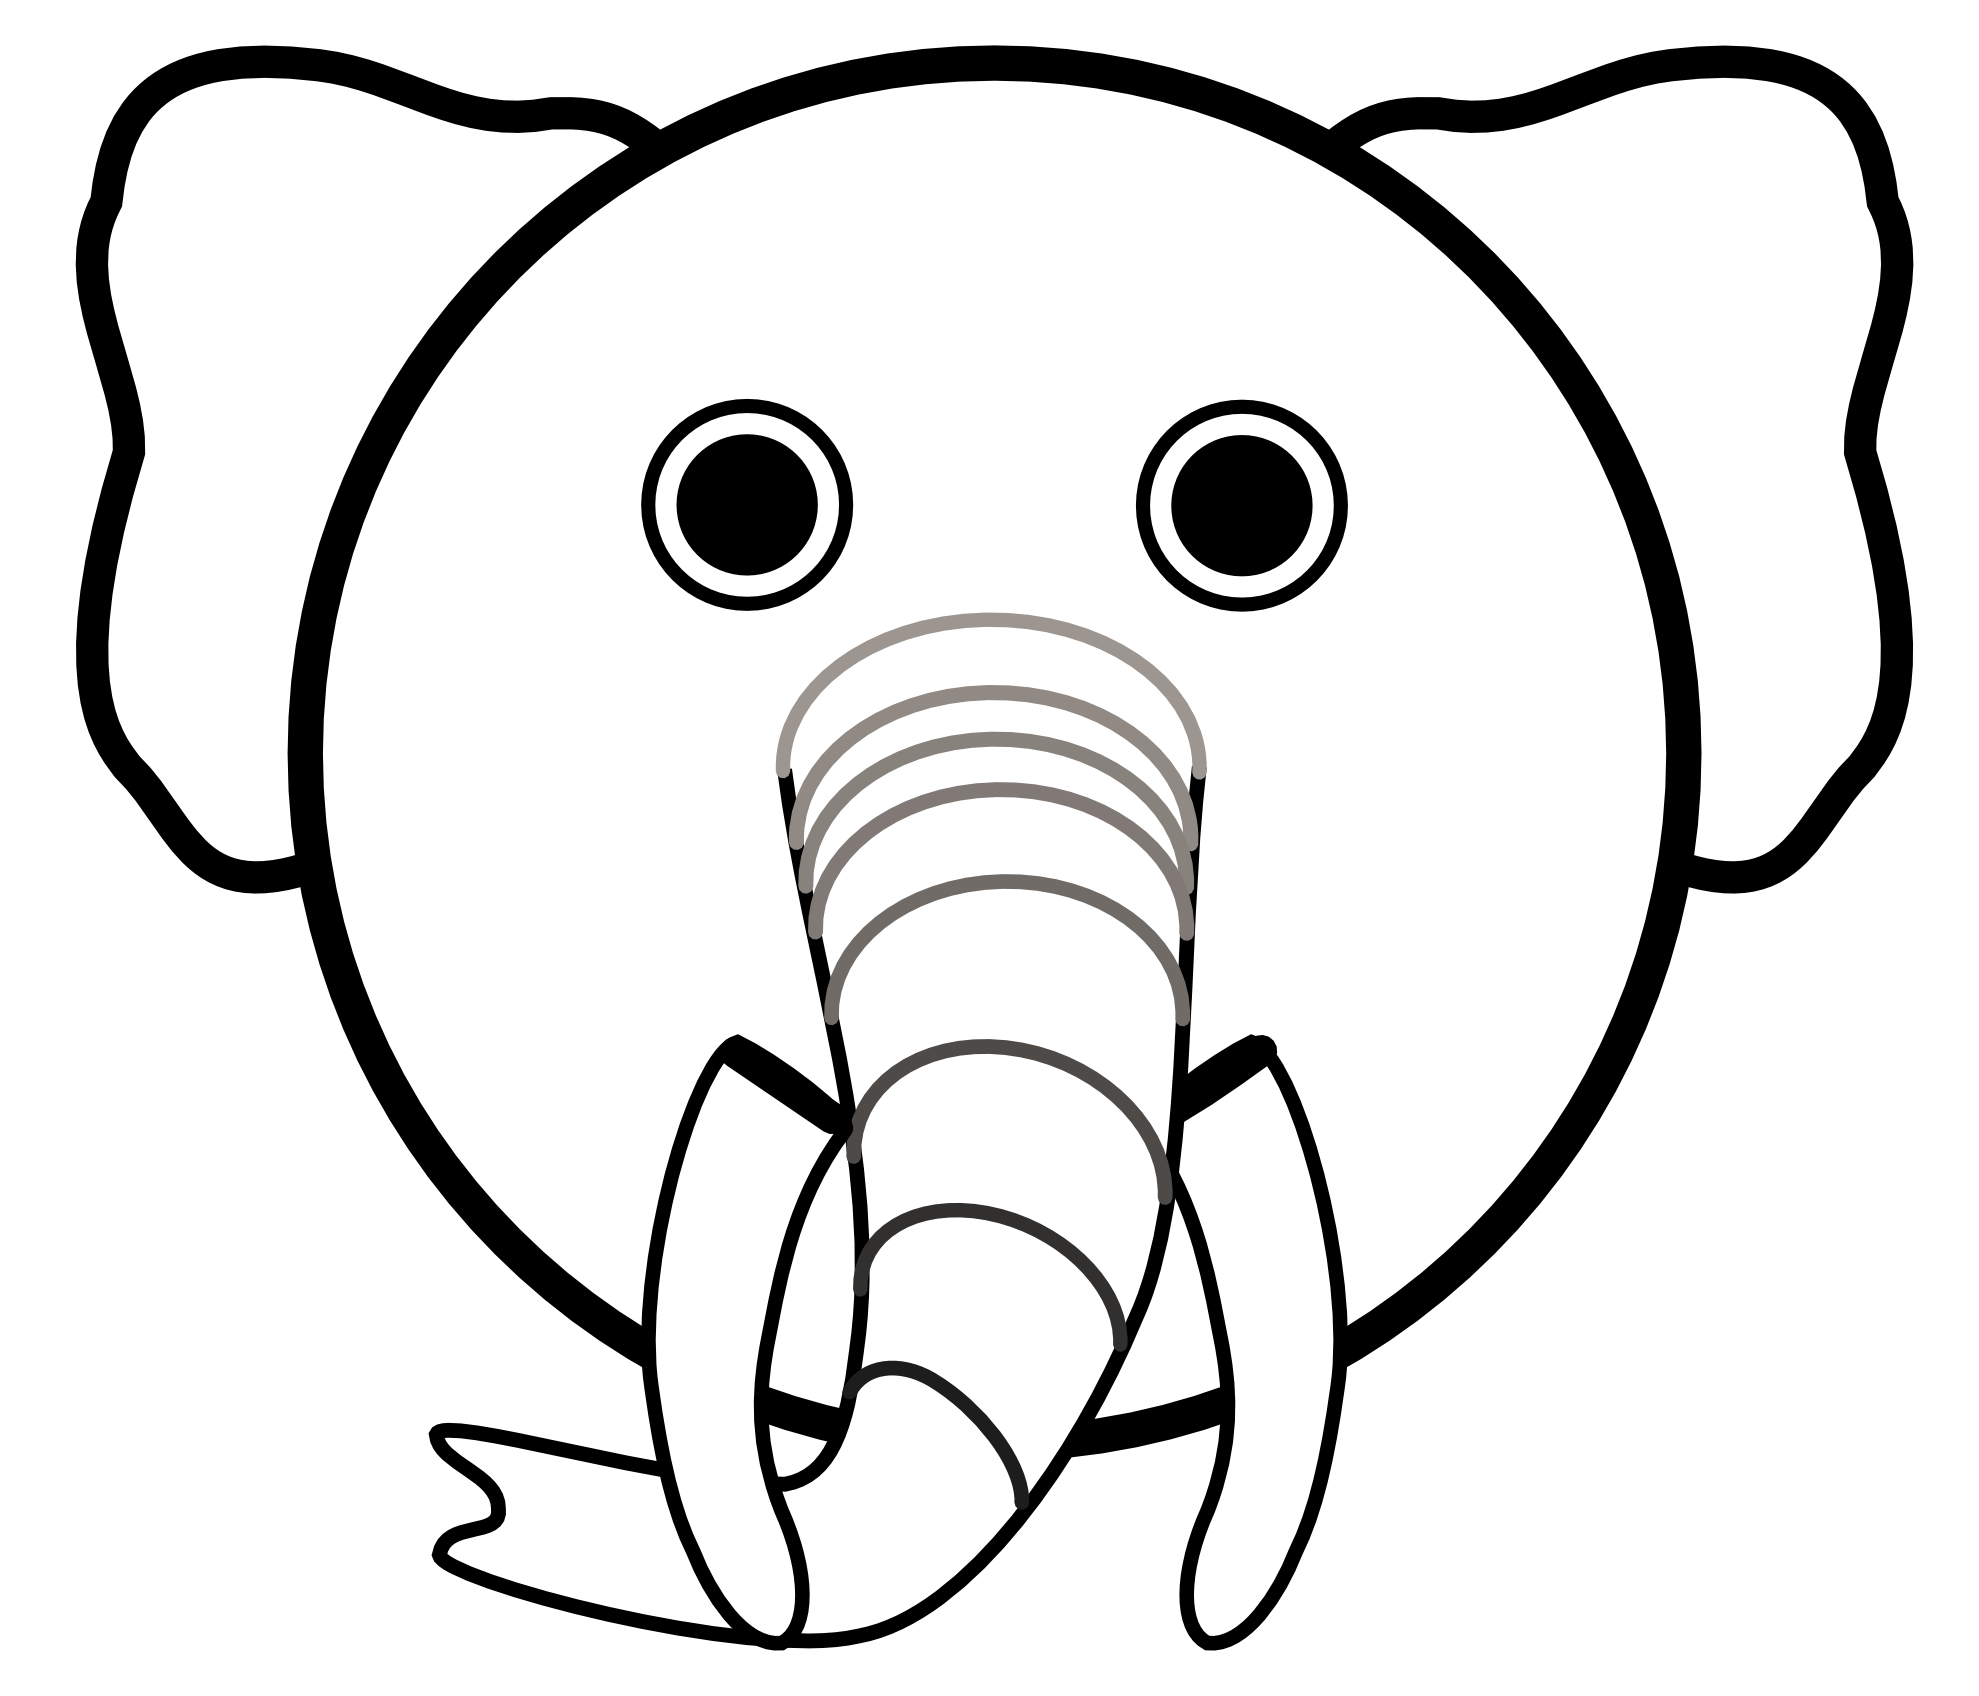 Cute panda free elephantheadclipartblackandwhite. Clipart elephant black and white